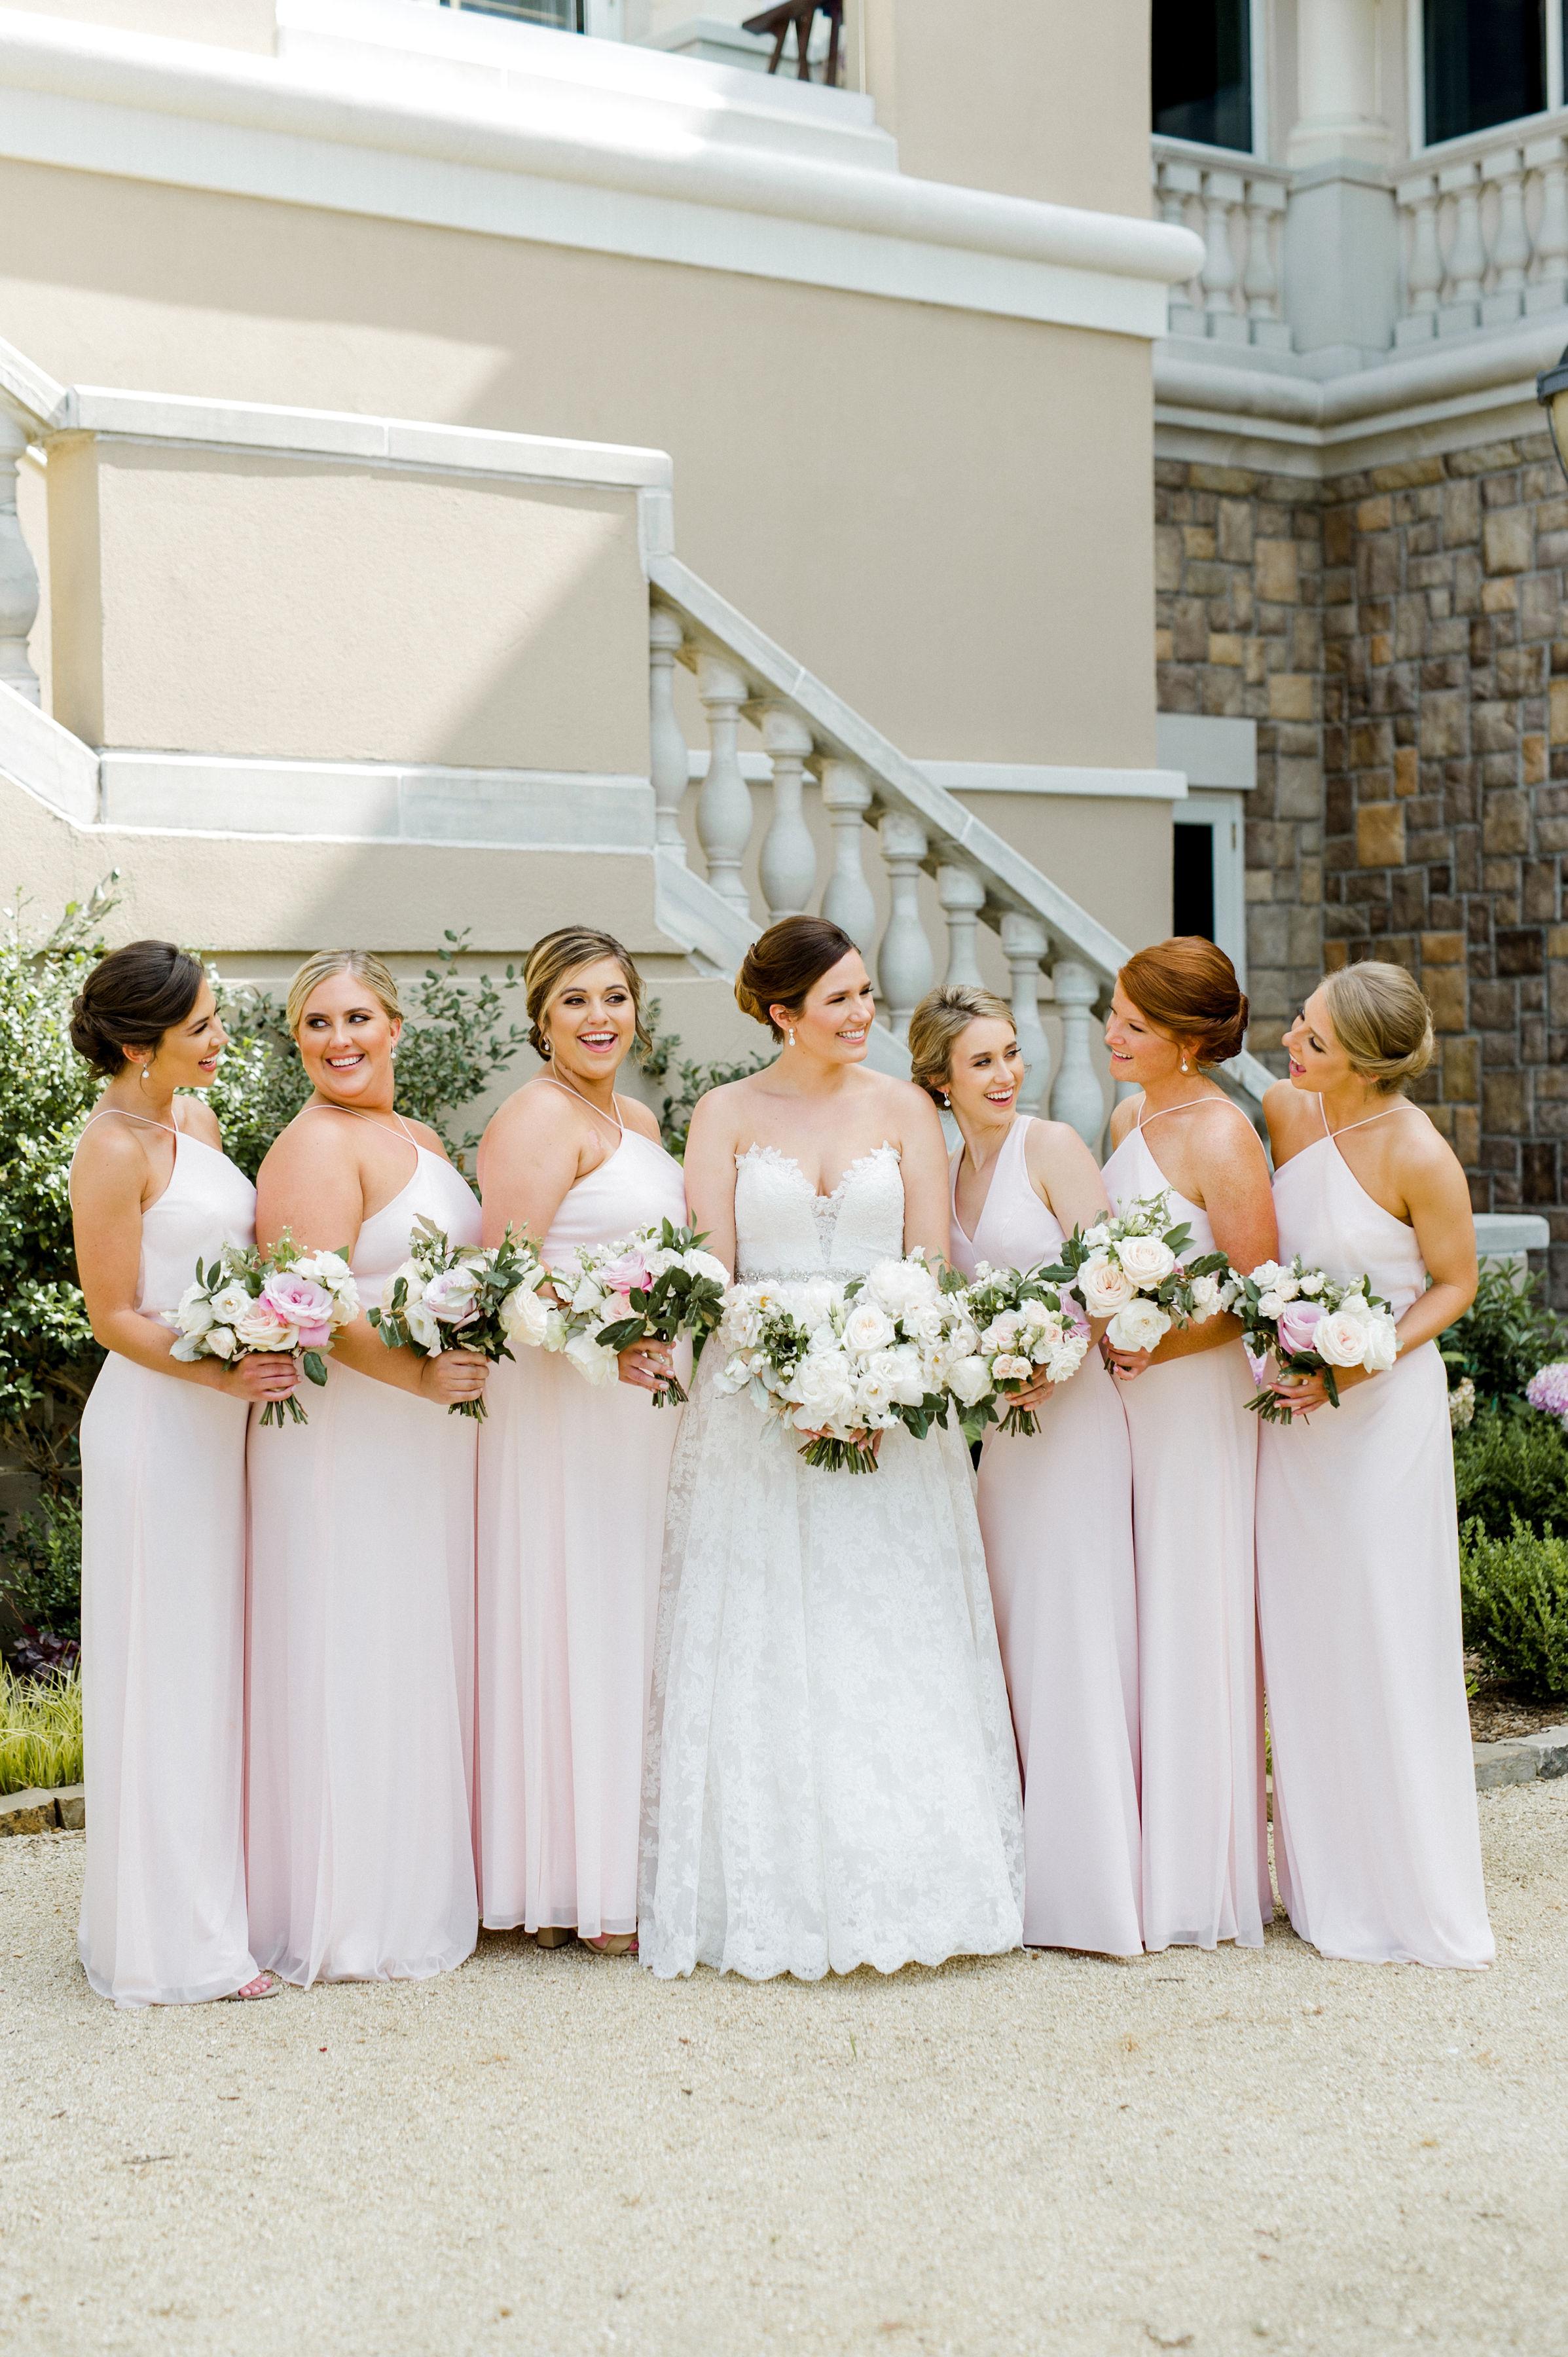 McElravey_Wedding_CarolineLimaPhotography_2018_165.jpg